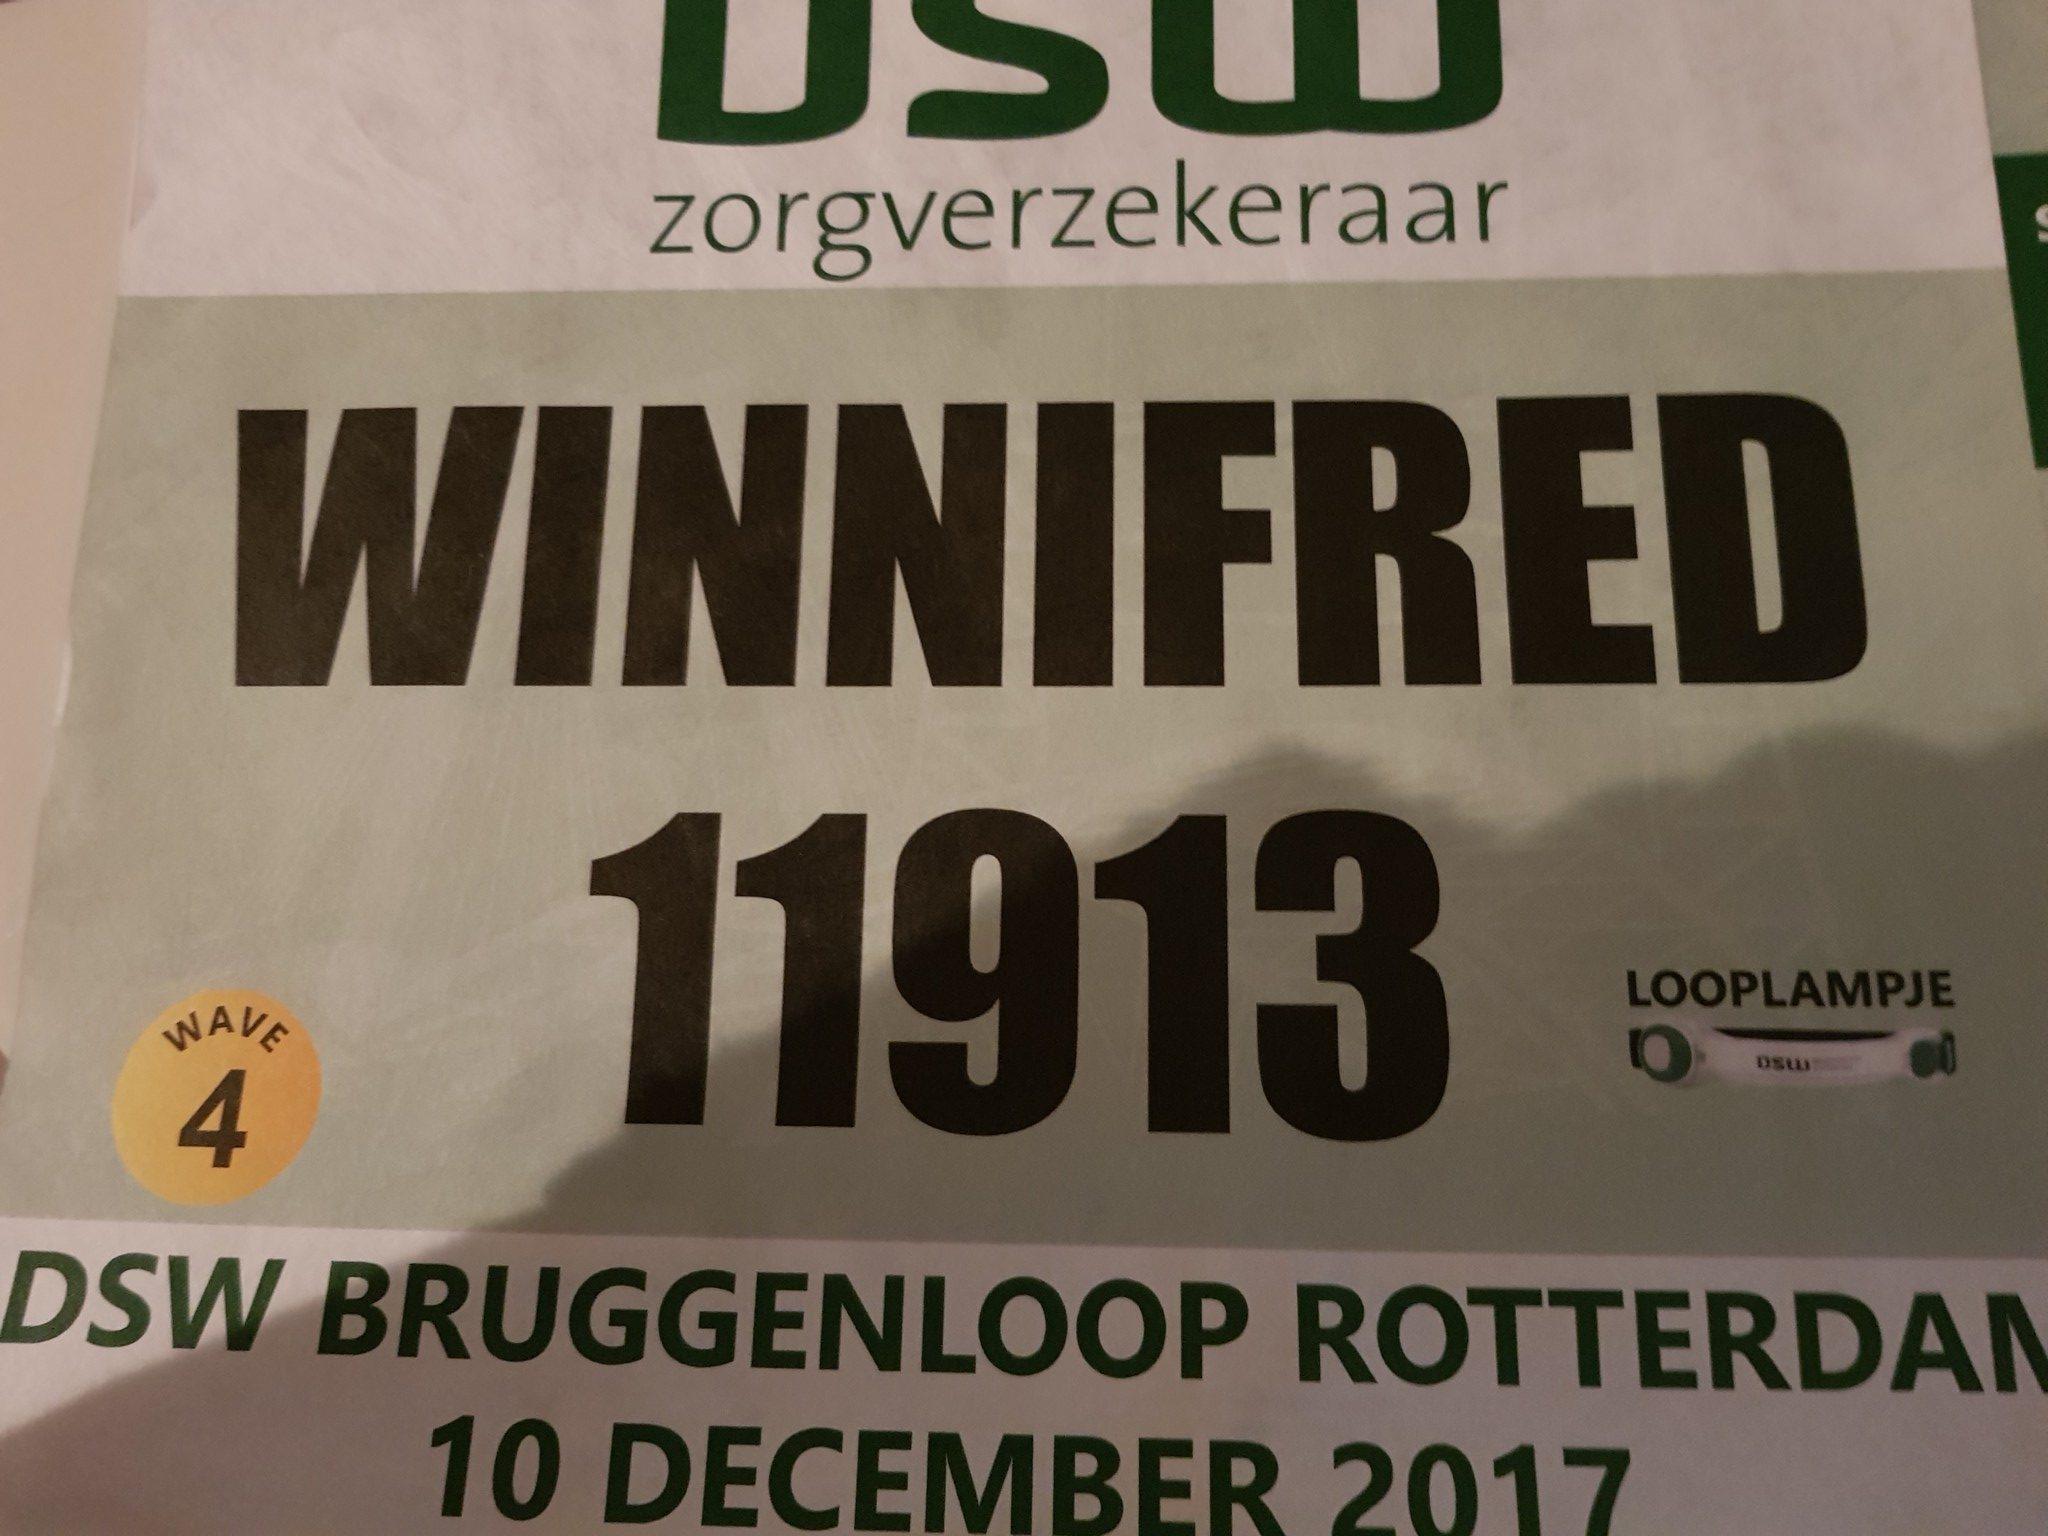 DSW Bruggenloop Rotterdam 2017